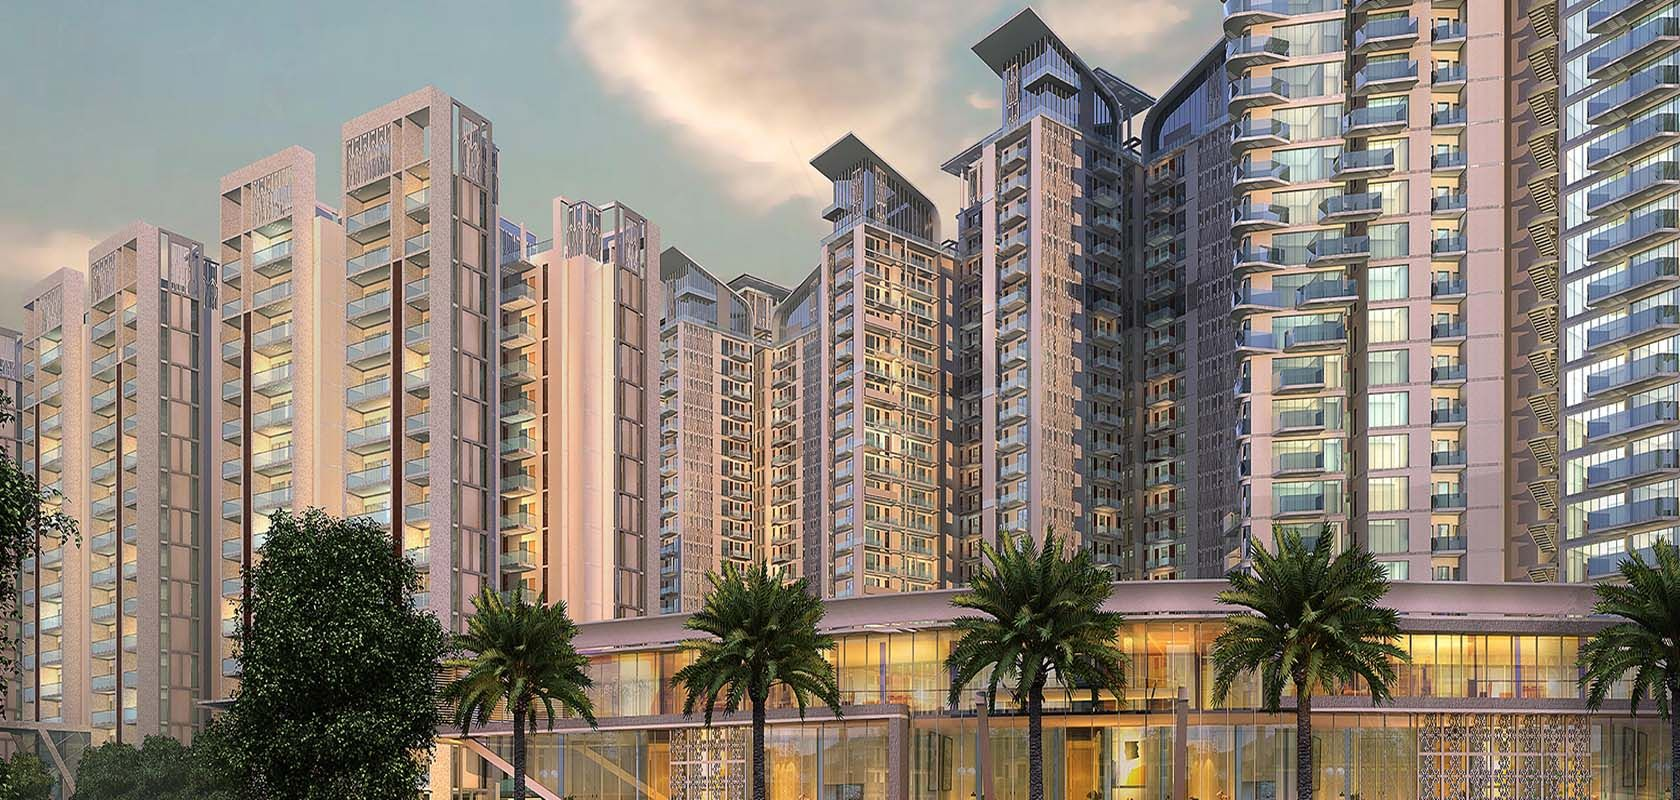 metropolitan housing project company